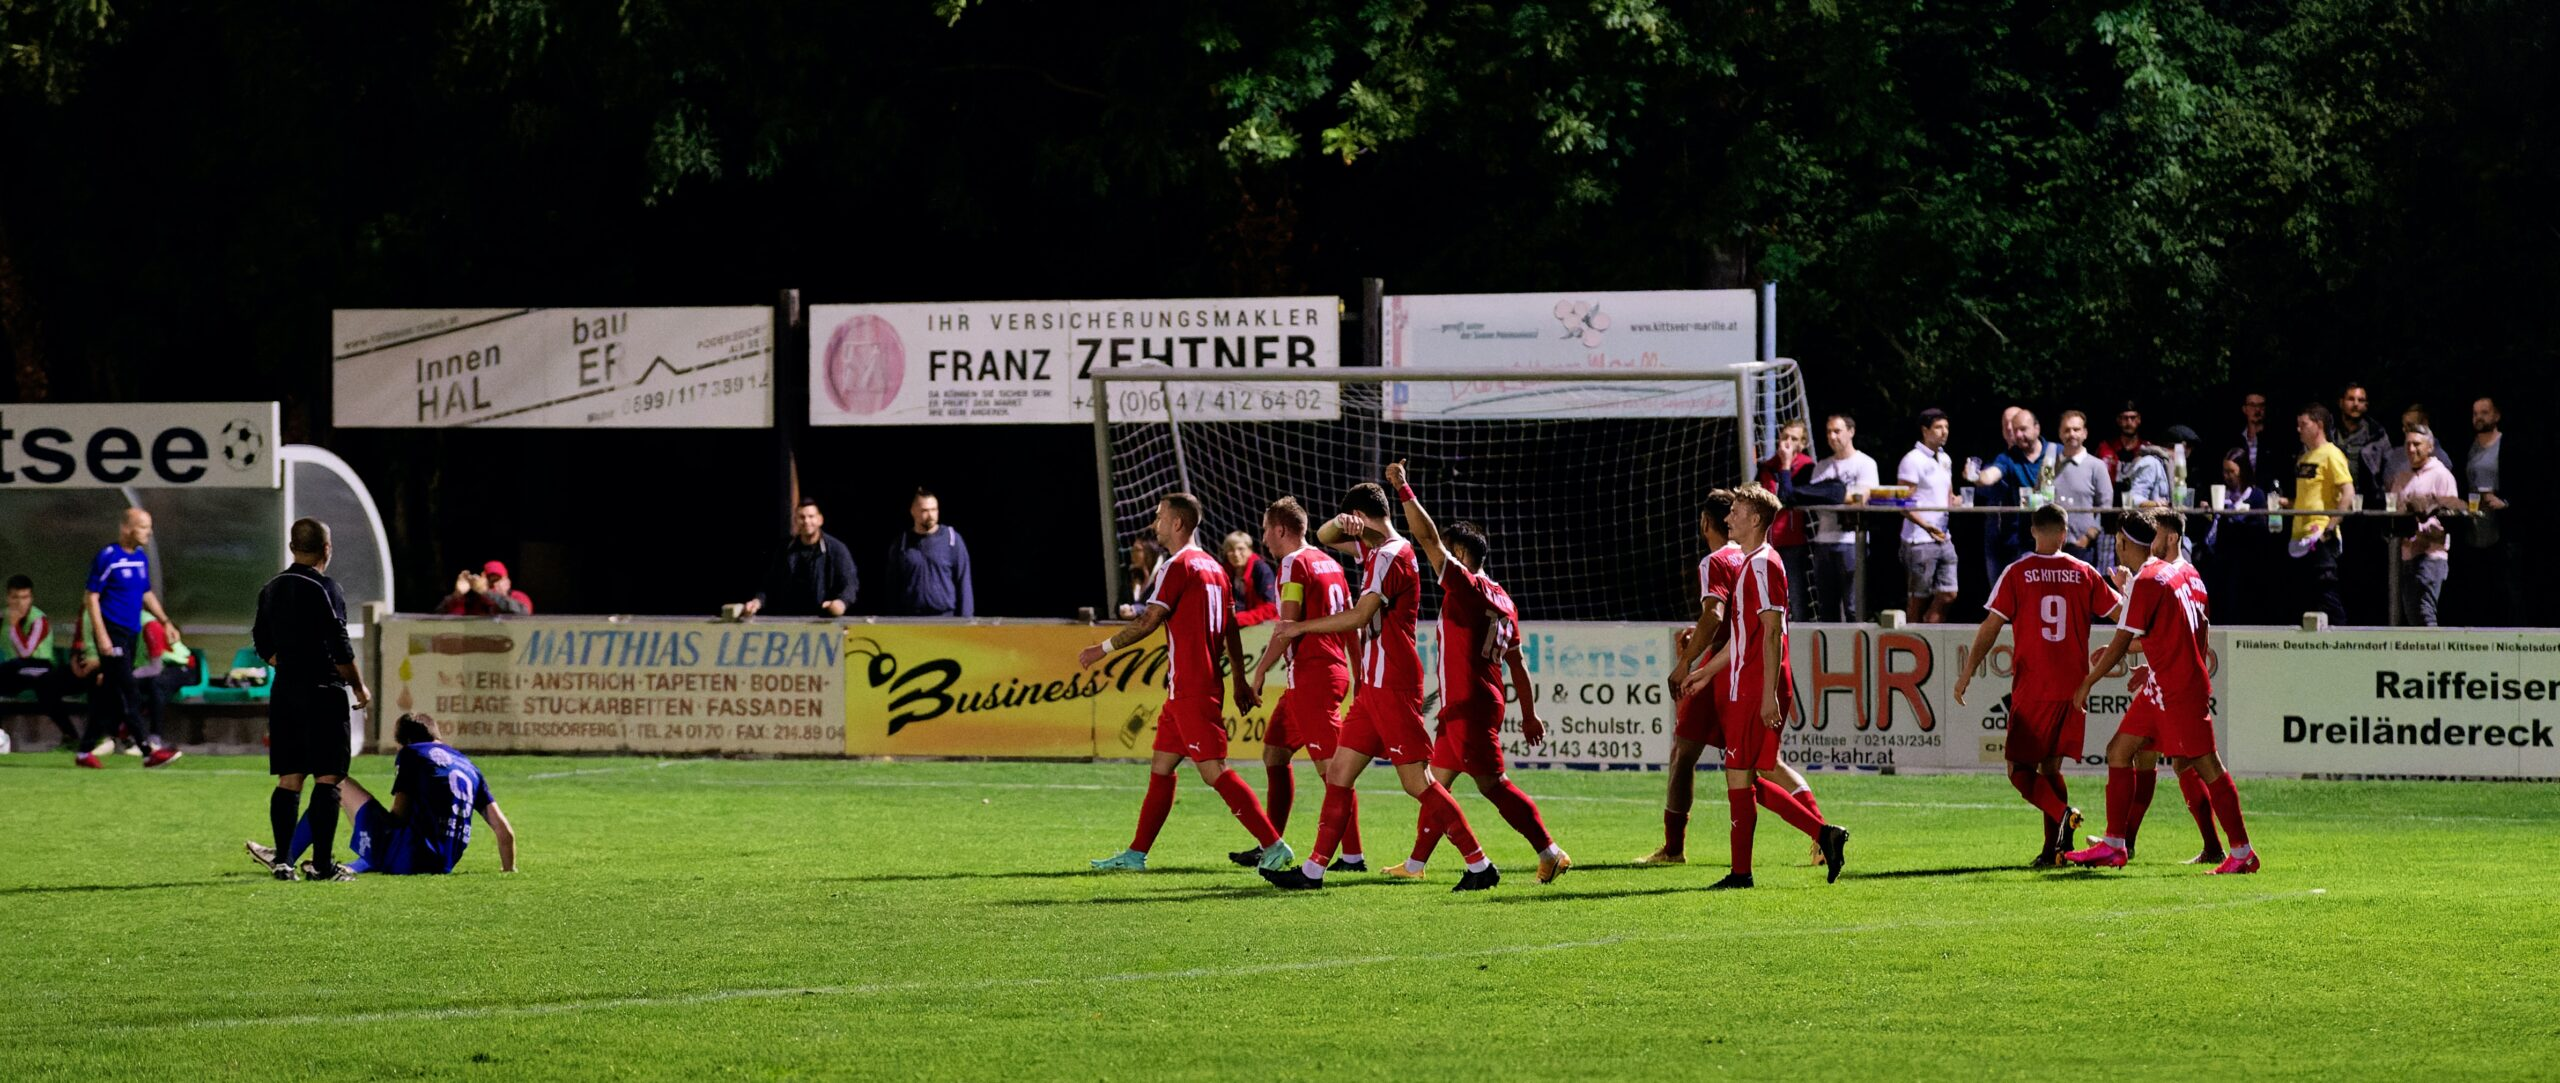 SC Kittsee celebrate Wisak goal